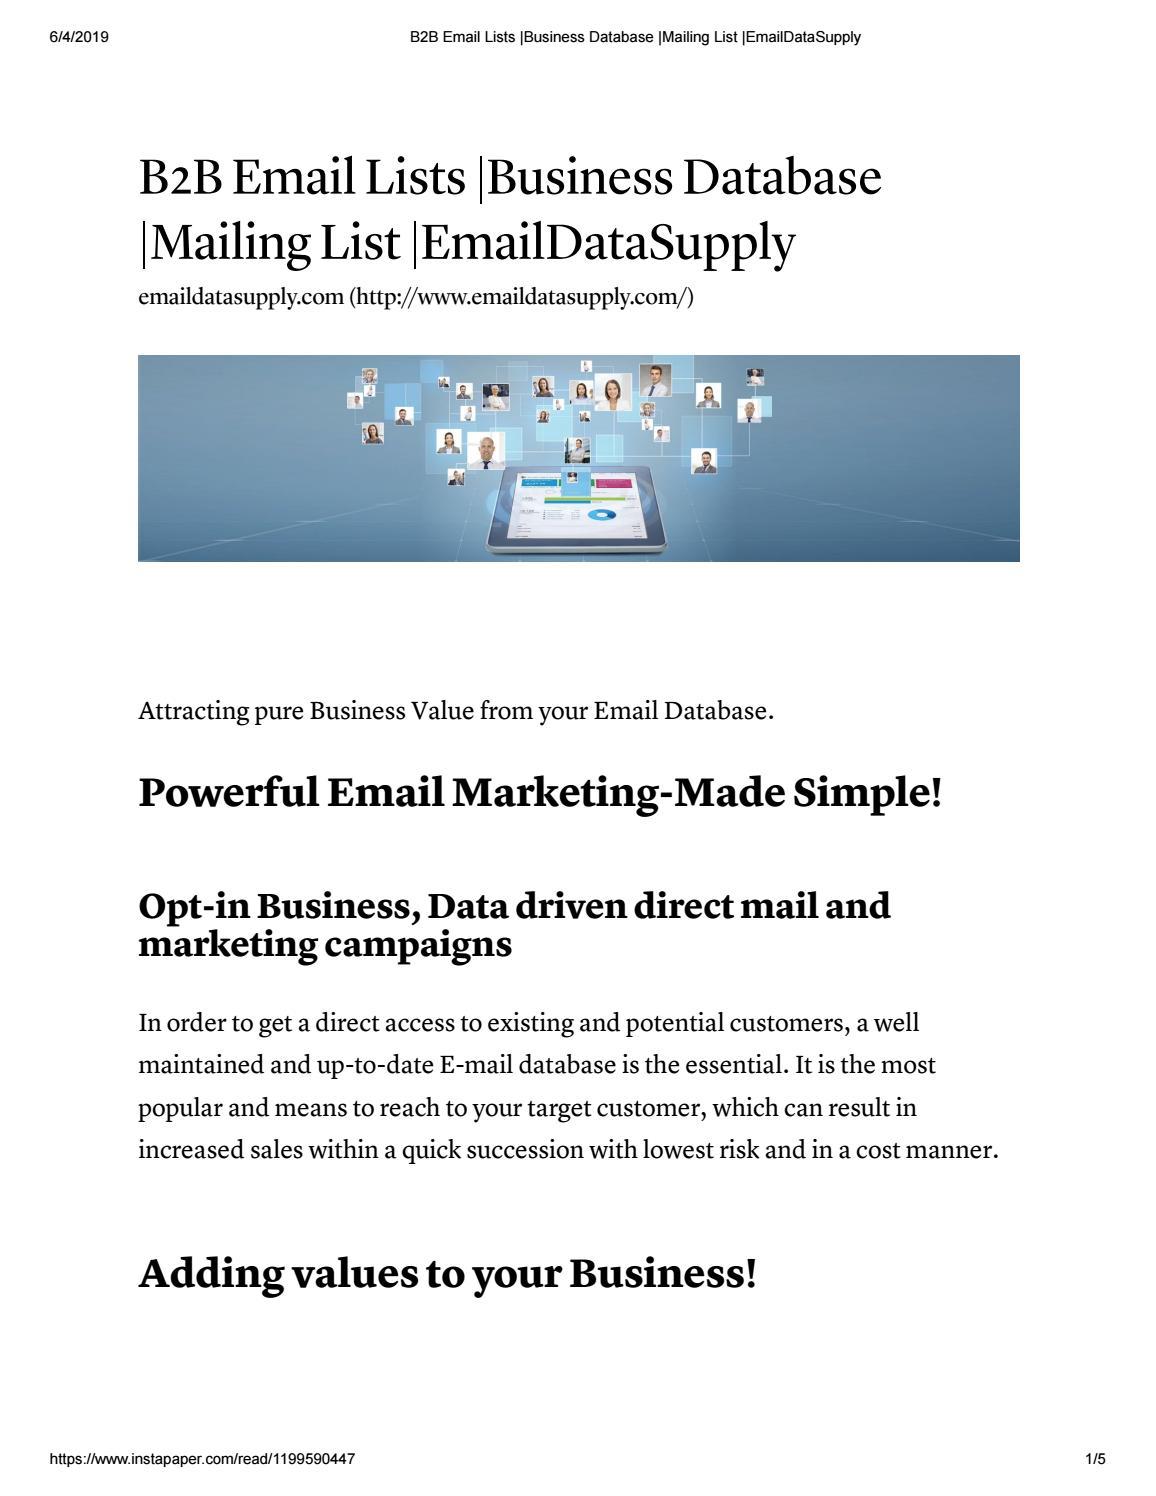 B2B Email Lists - Email Datasupply by christiana Steve - issuu